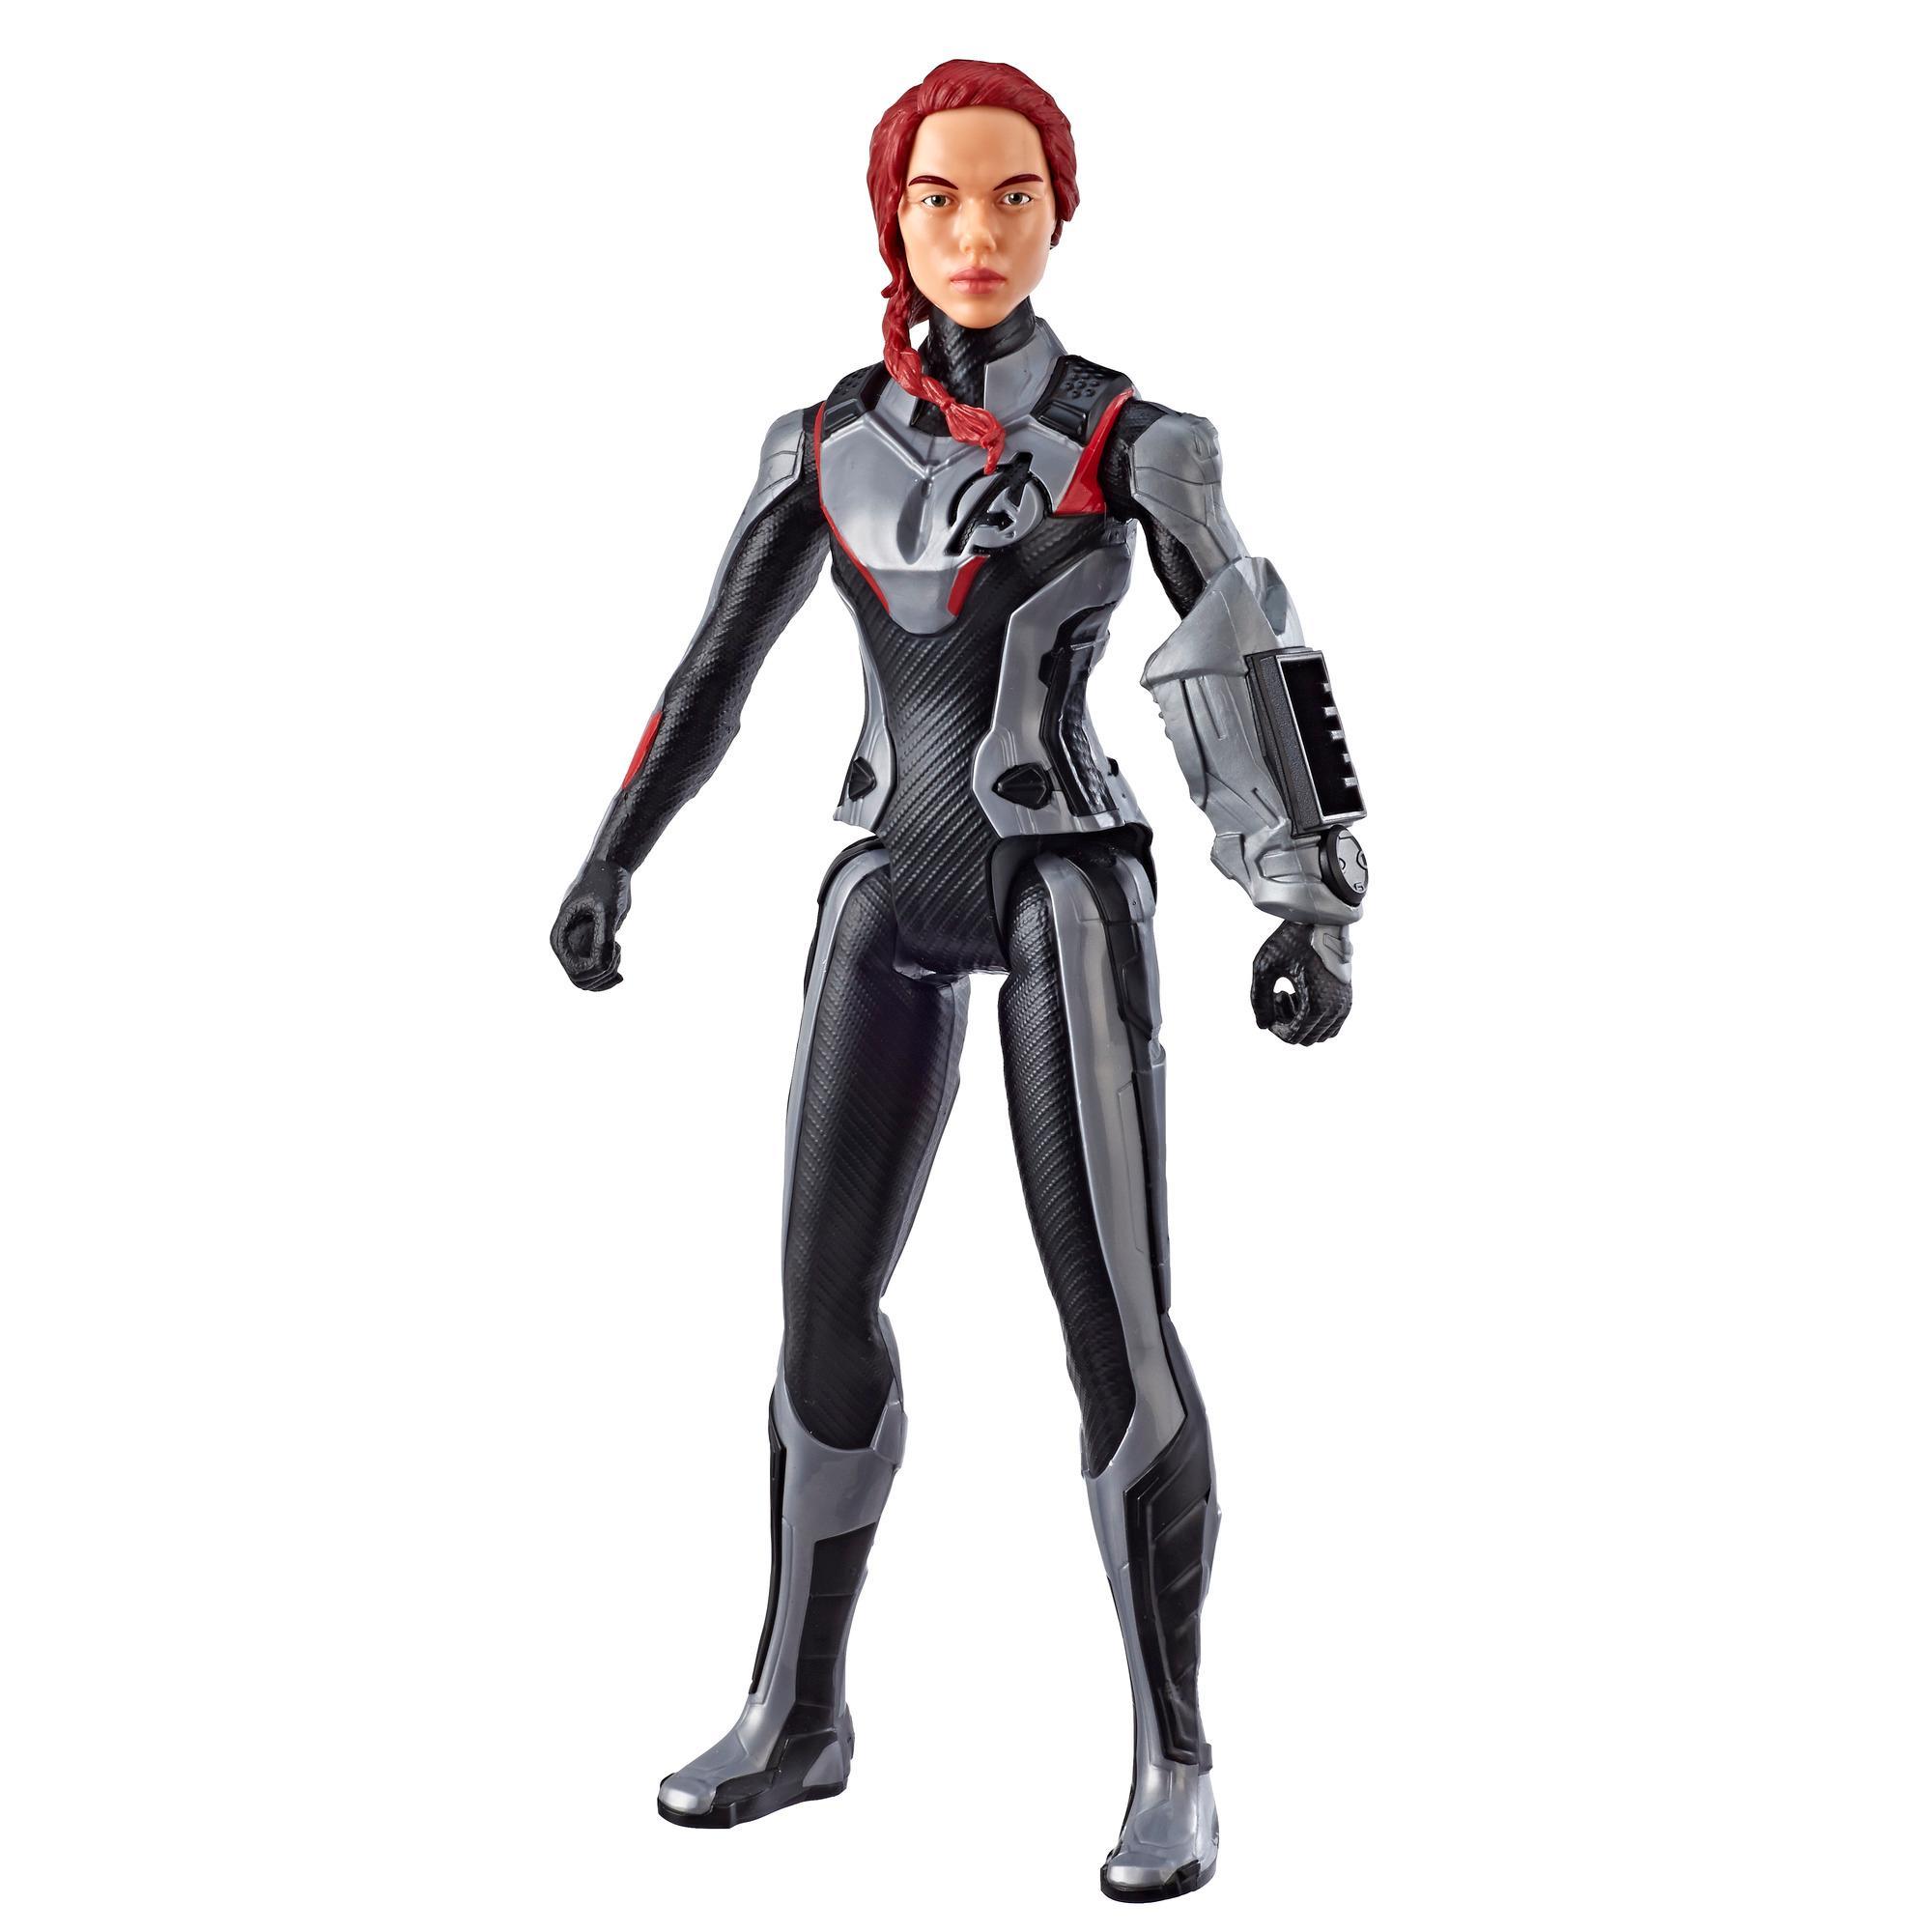 Marvel Avengers : Phase finale Titan Hero Series - Figurine jouet de superhéroïne Black Widow de 30 cm avec port Titan Hero Power FX